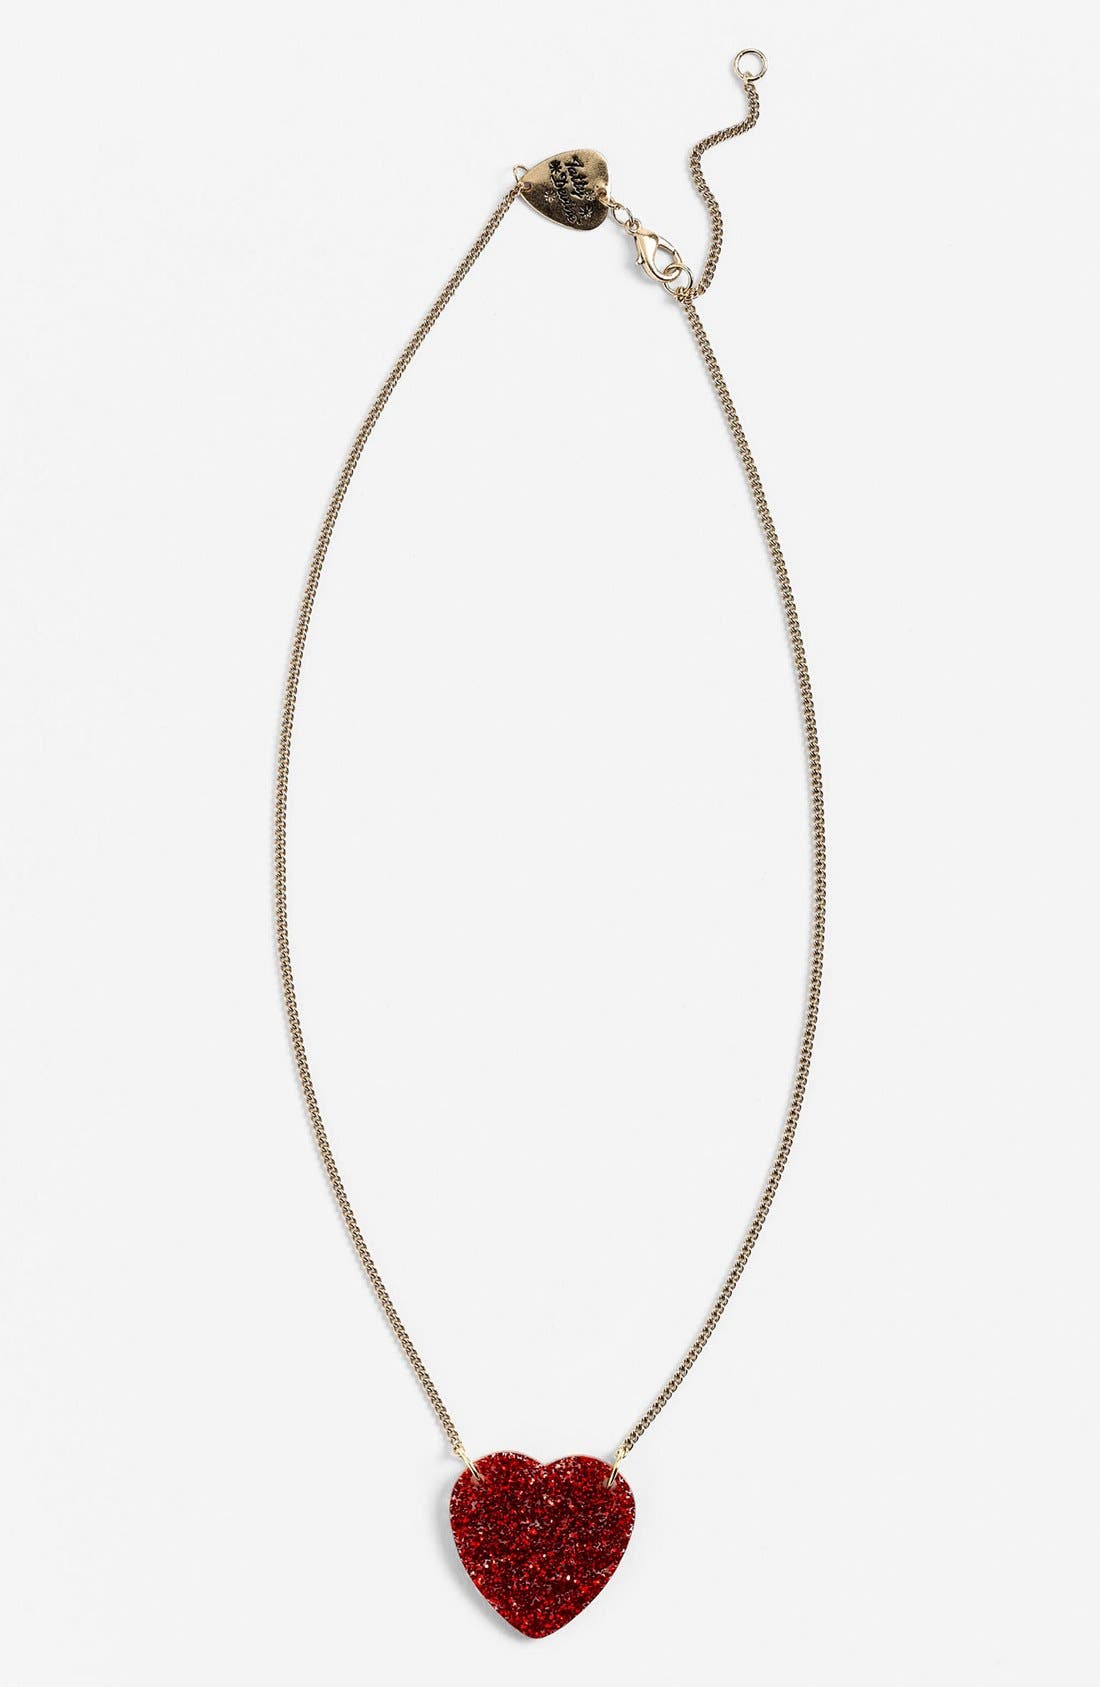 Alternate Image 1 Selected - Tatty Devine 'Glitter Heart' Necklace